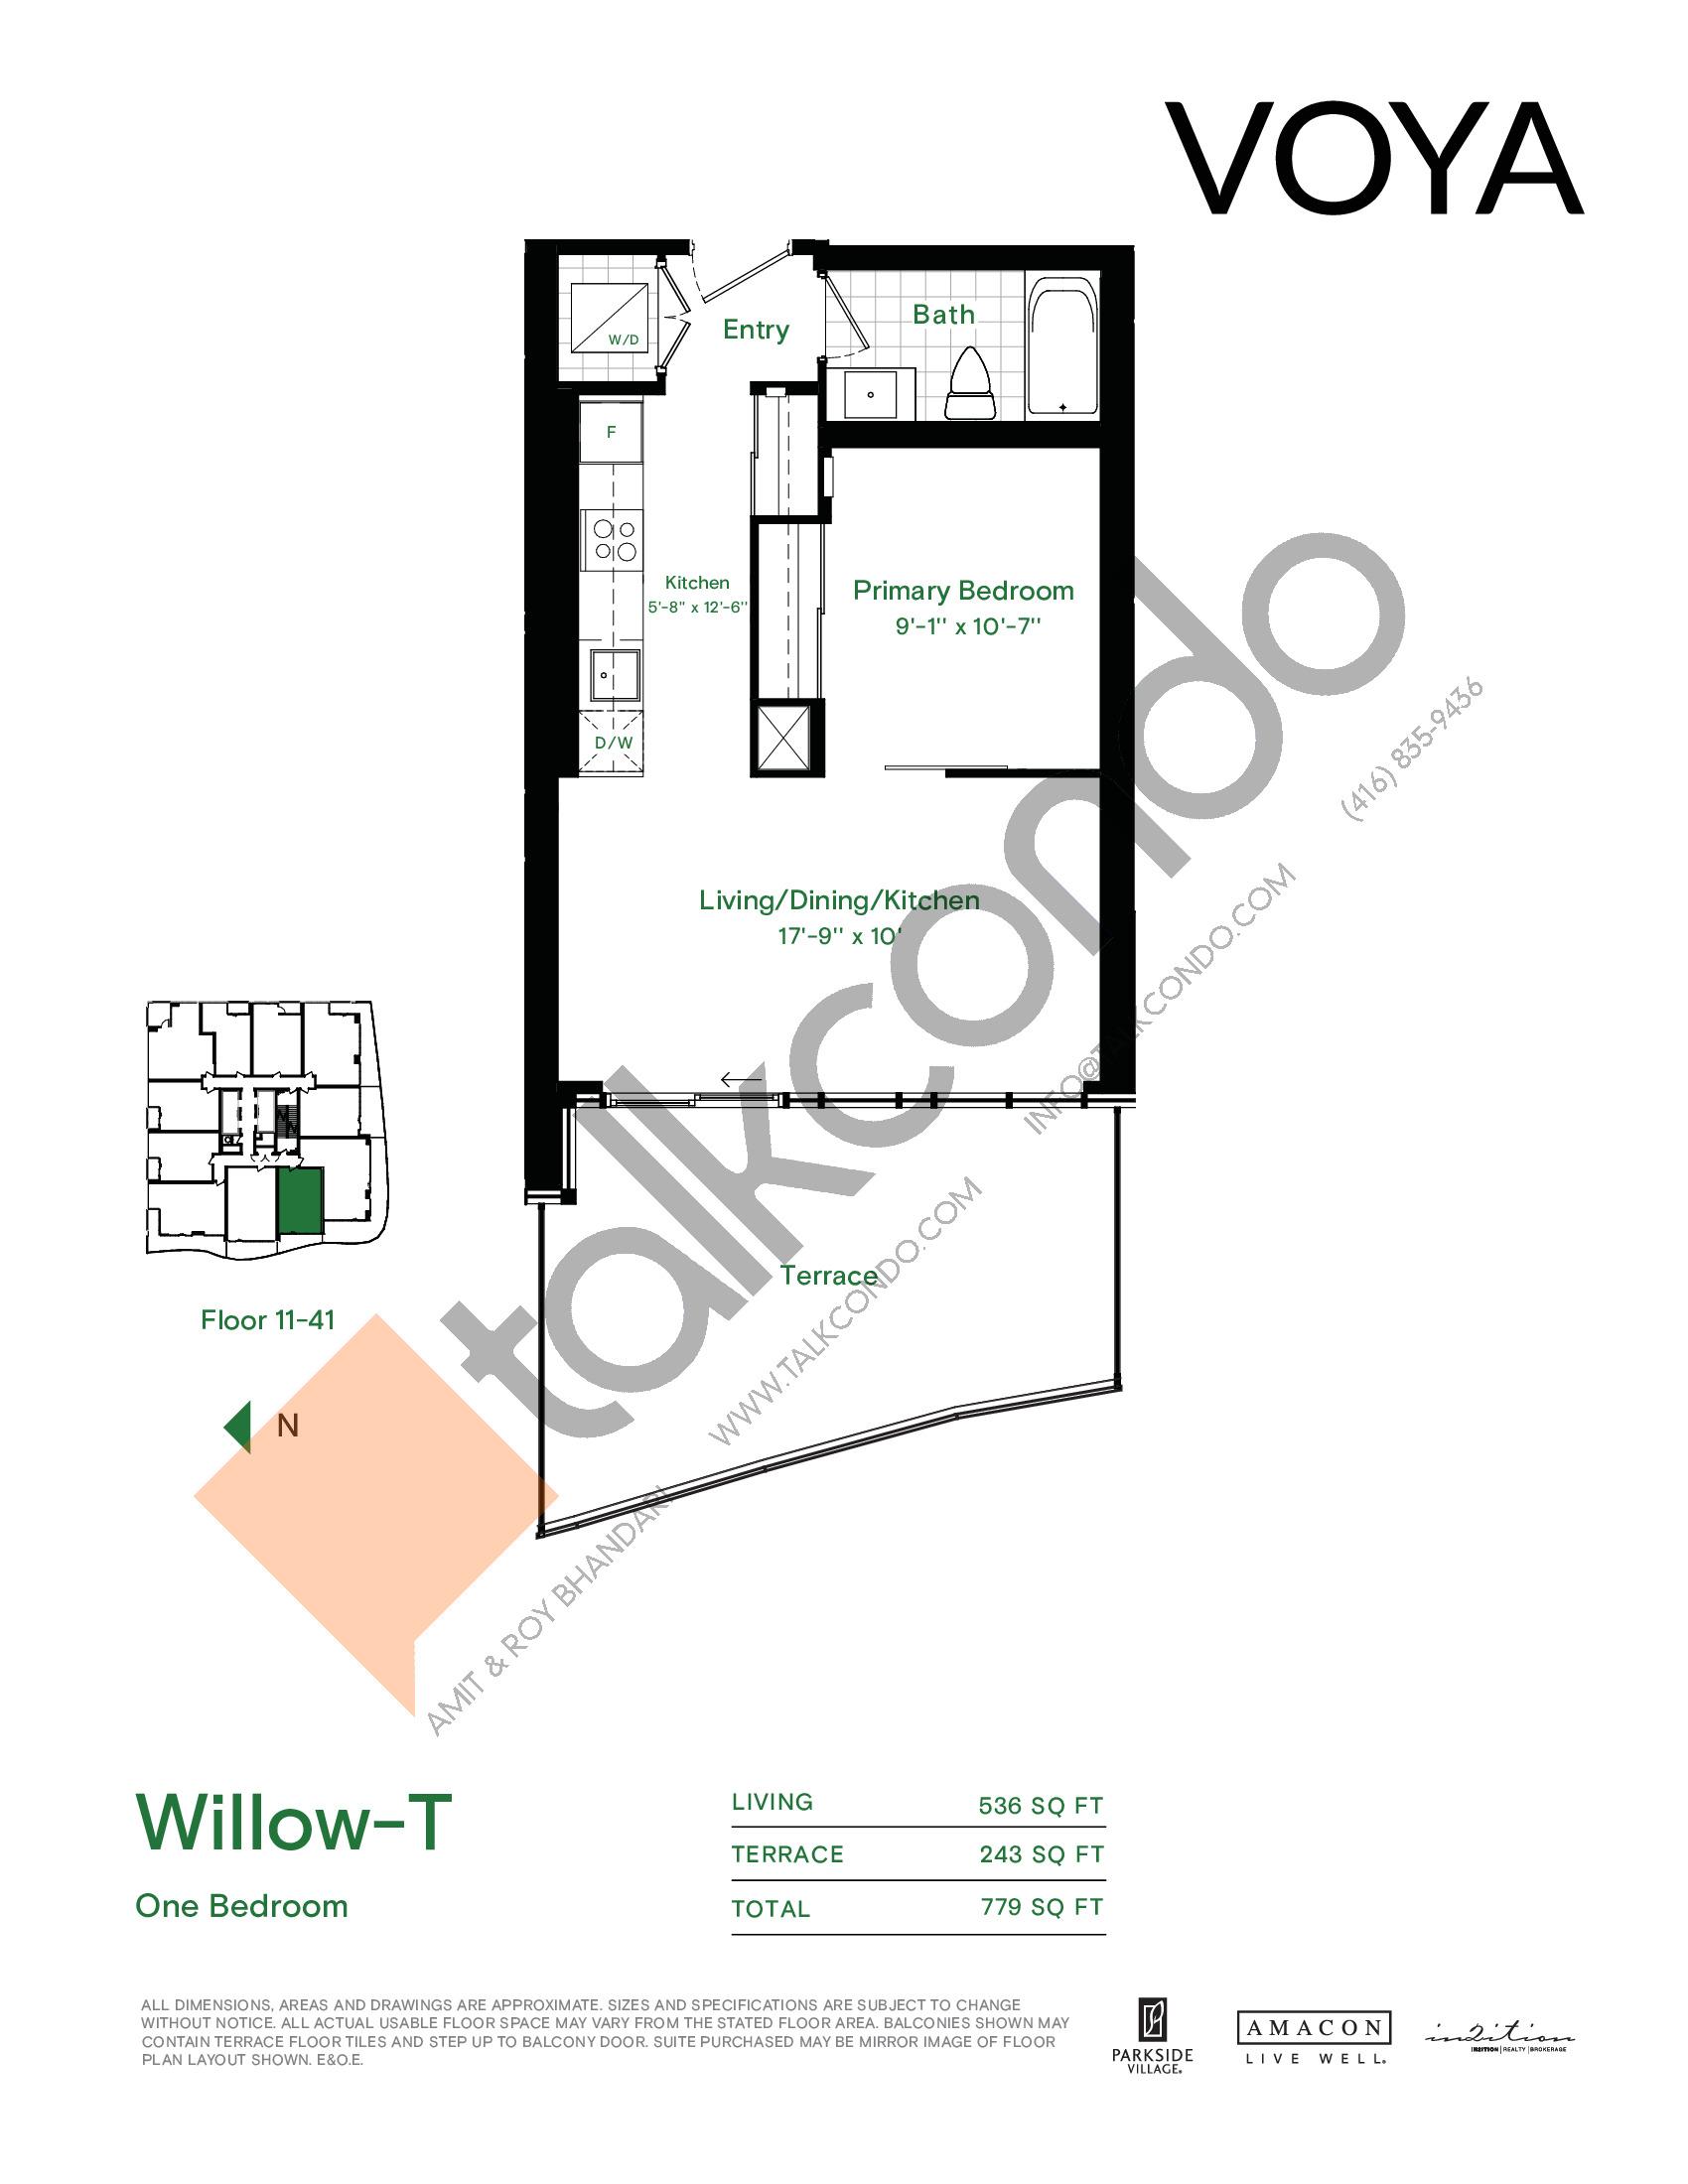 Willow-T Floor Plan at Voya at Parkside Village Condos - 536 sq.ft